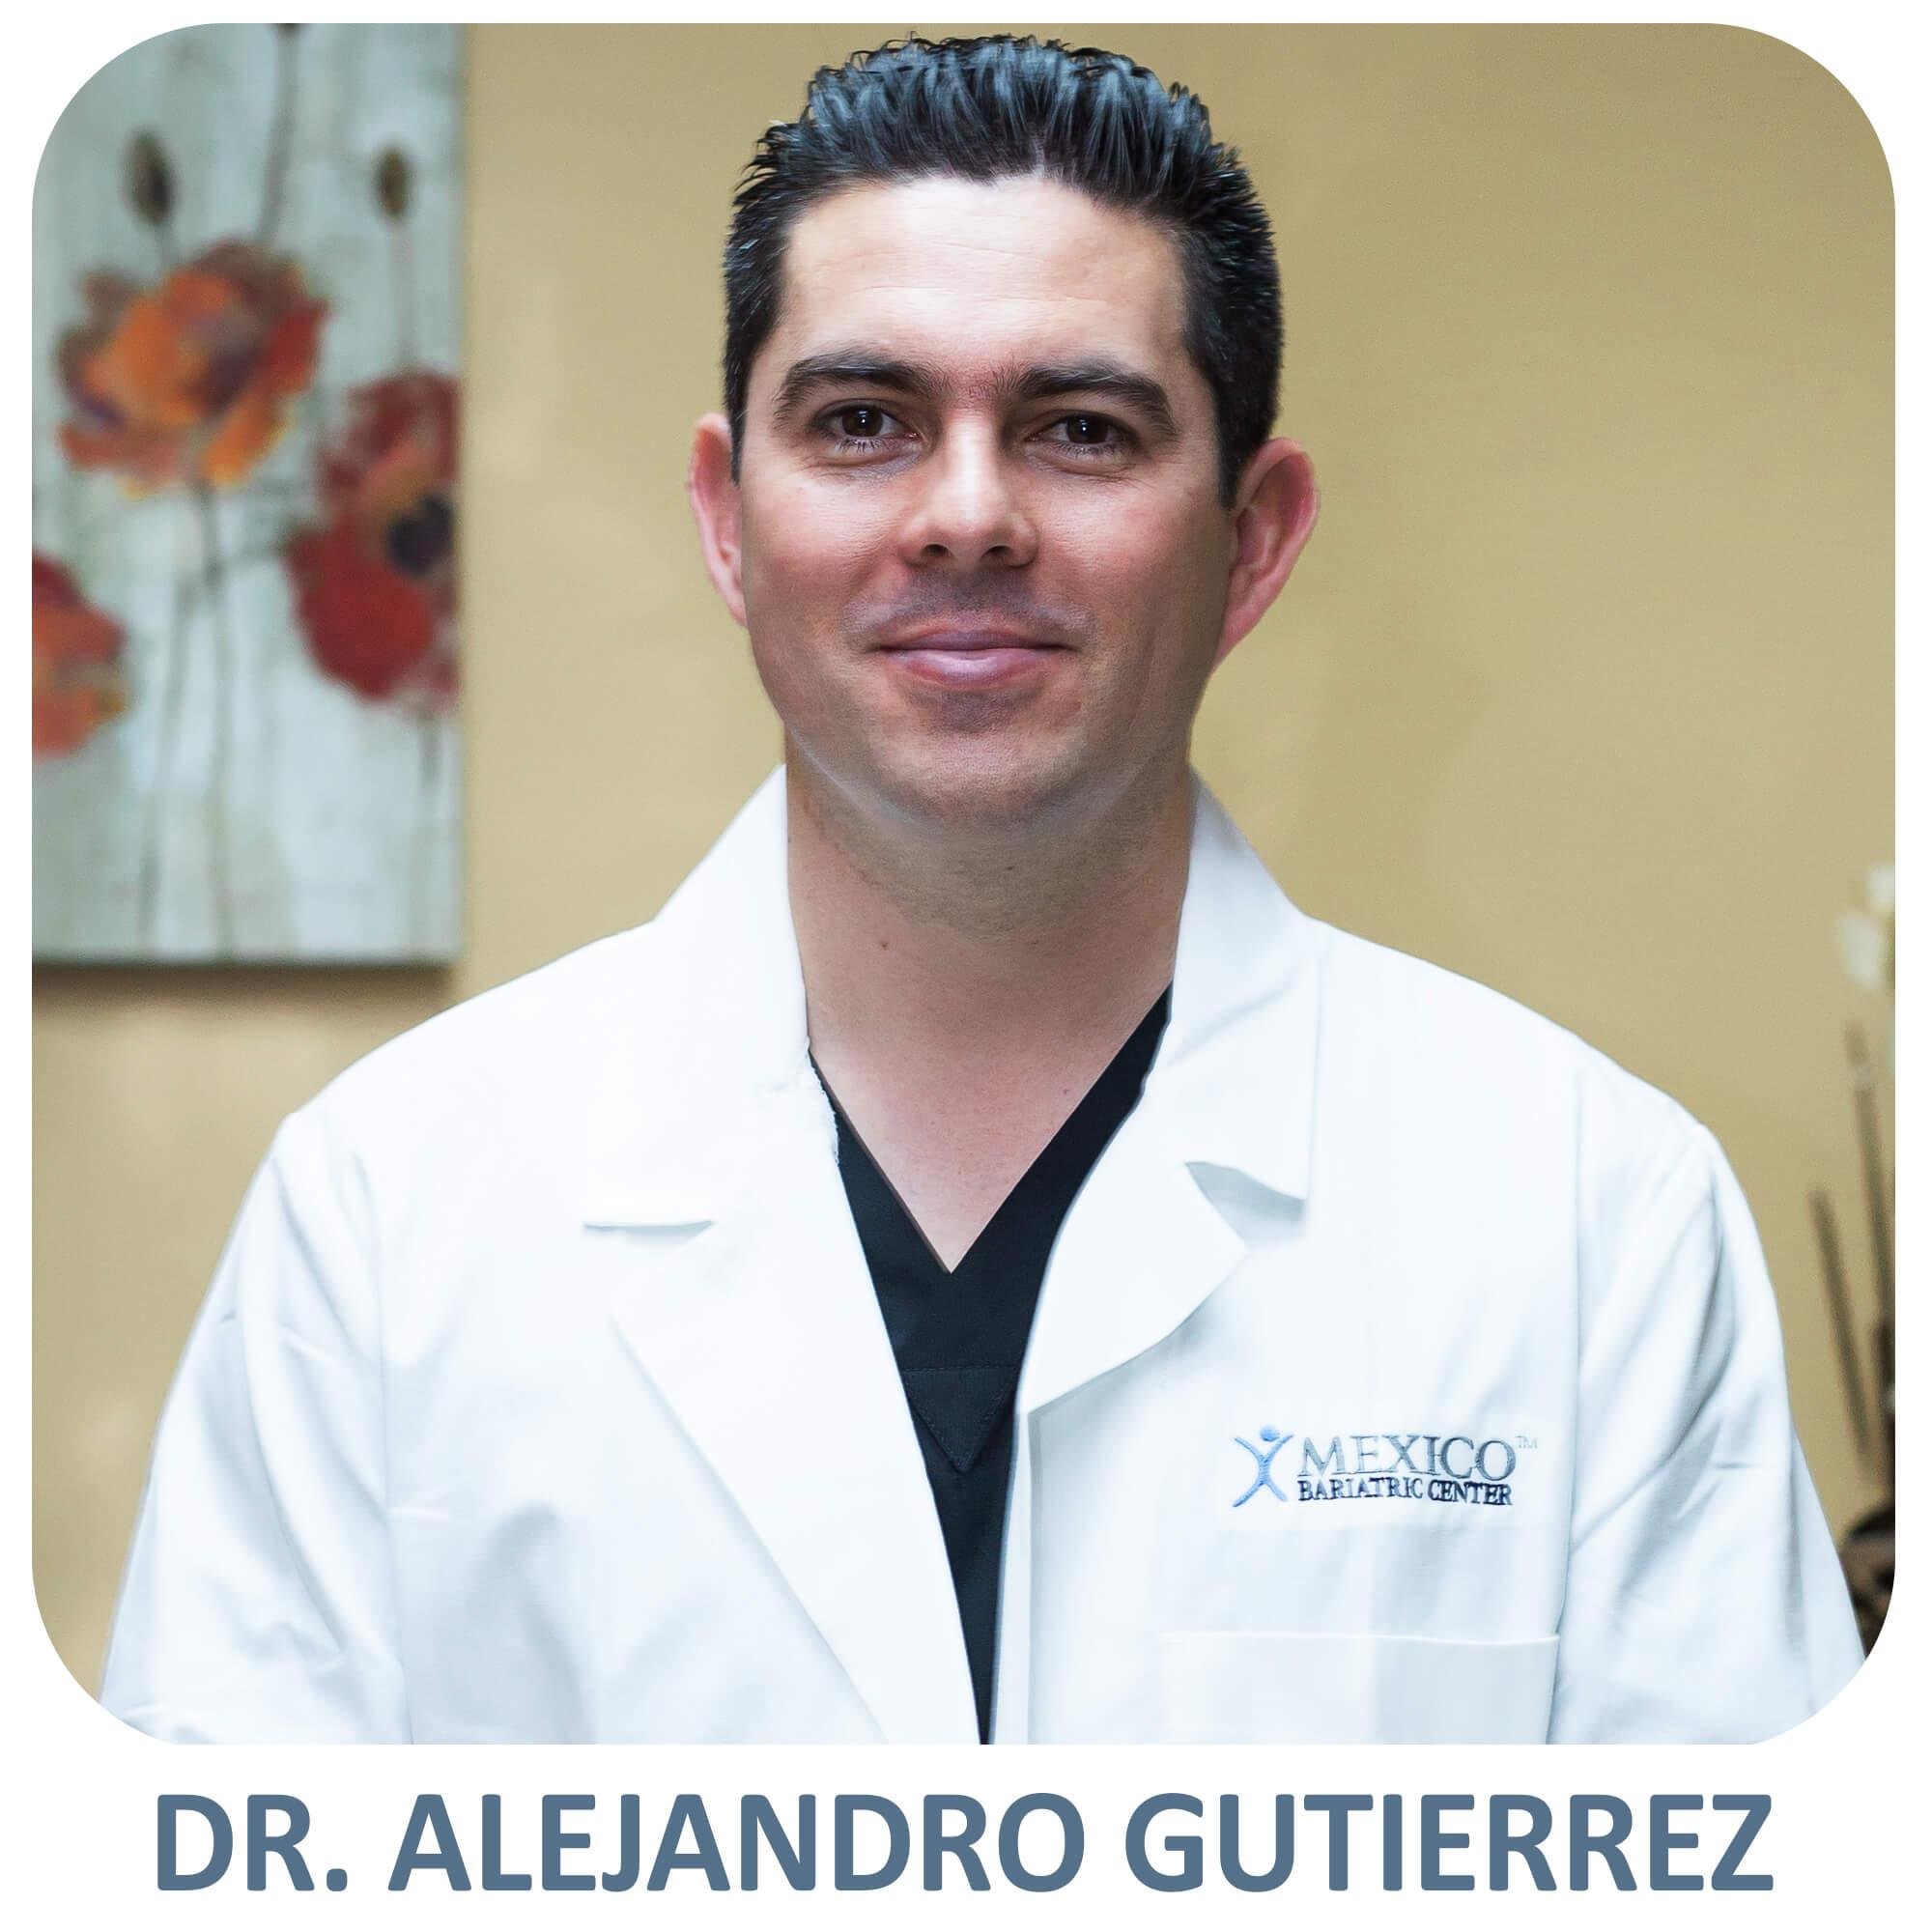 Dr. Alejandro Gutierrez - Mexico Gastric Sleeve Surgeon